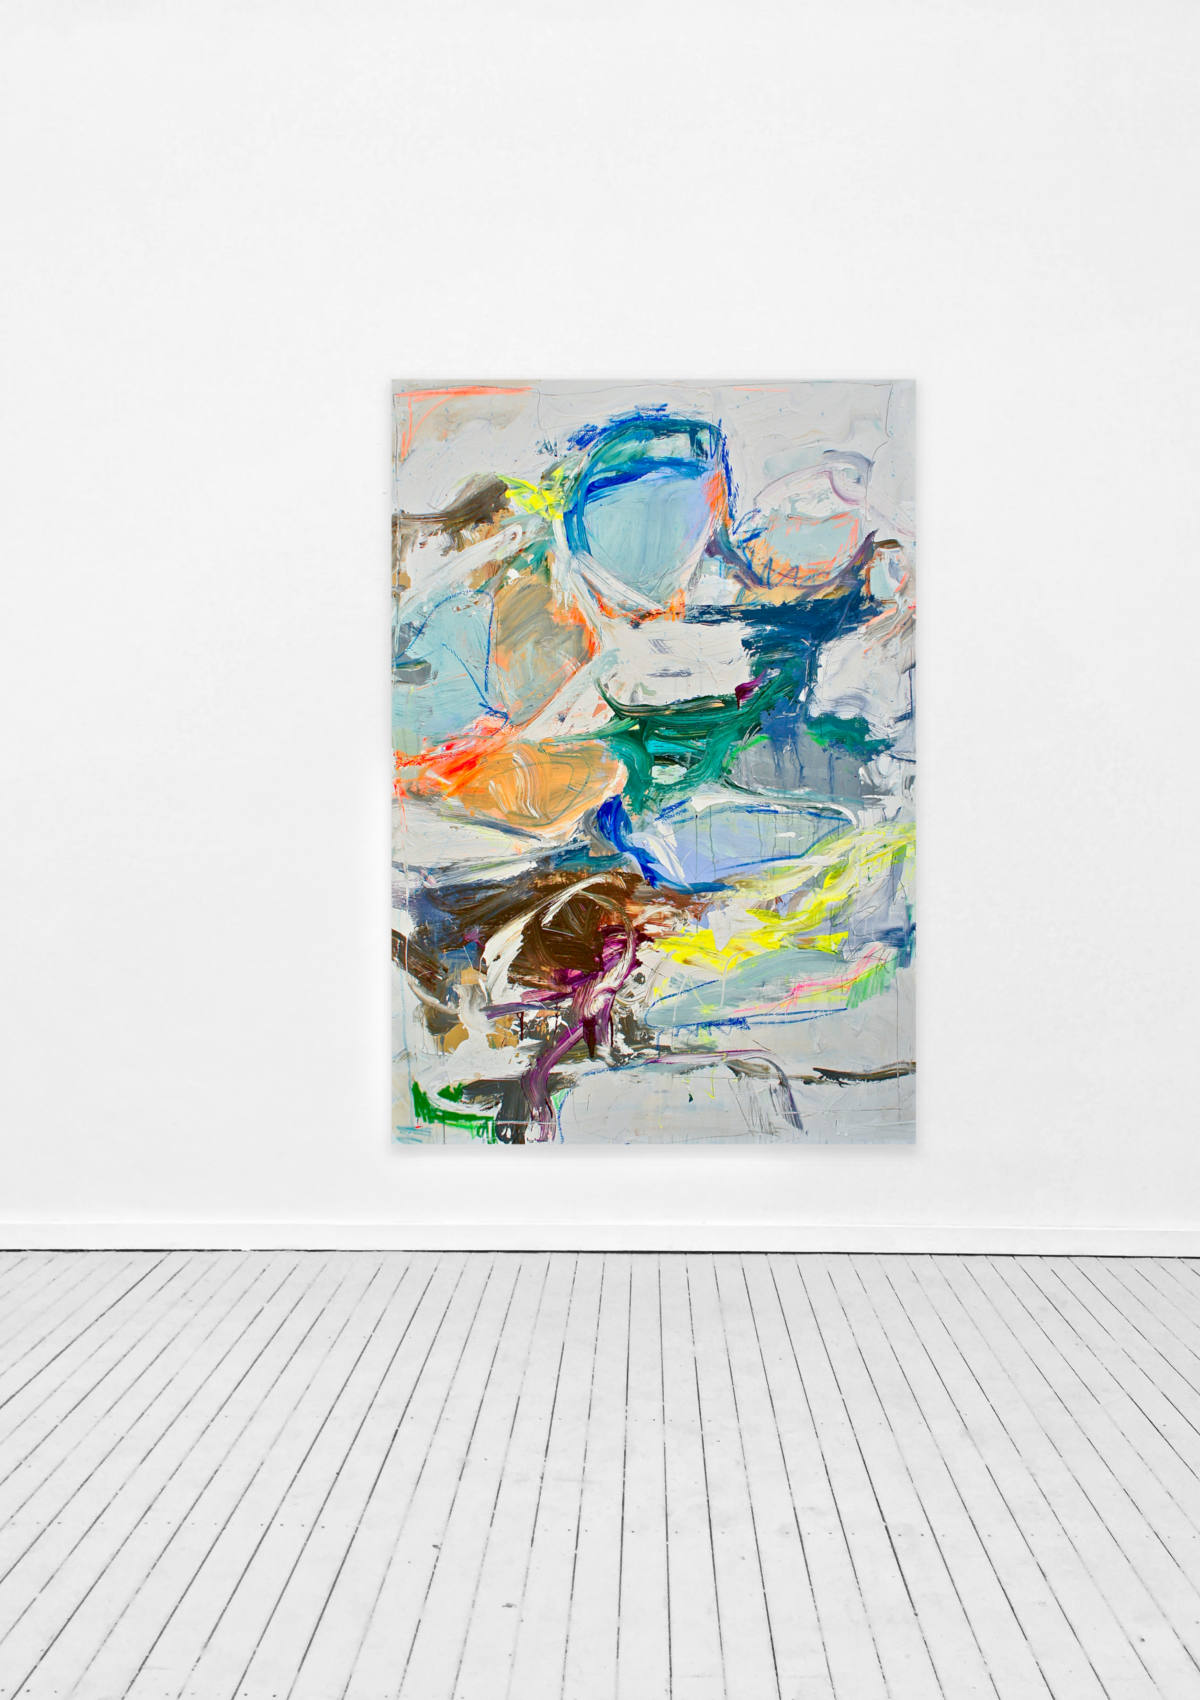 Werk_1_Kallrath_Theresa_Colour me couture_Mixed Media on Canvas_140x200_2018